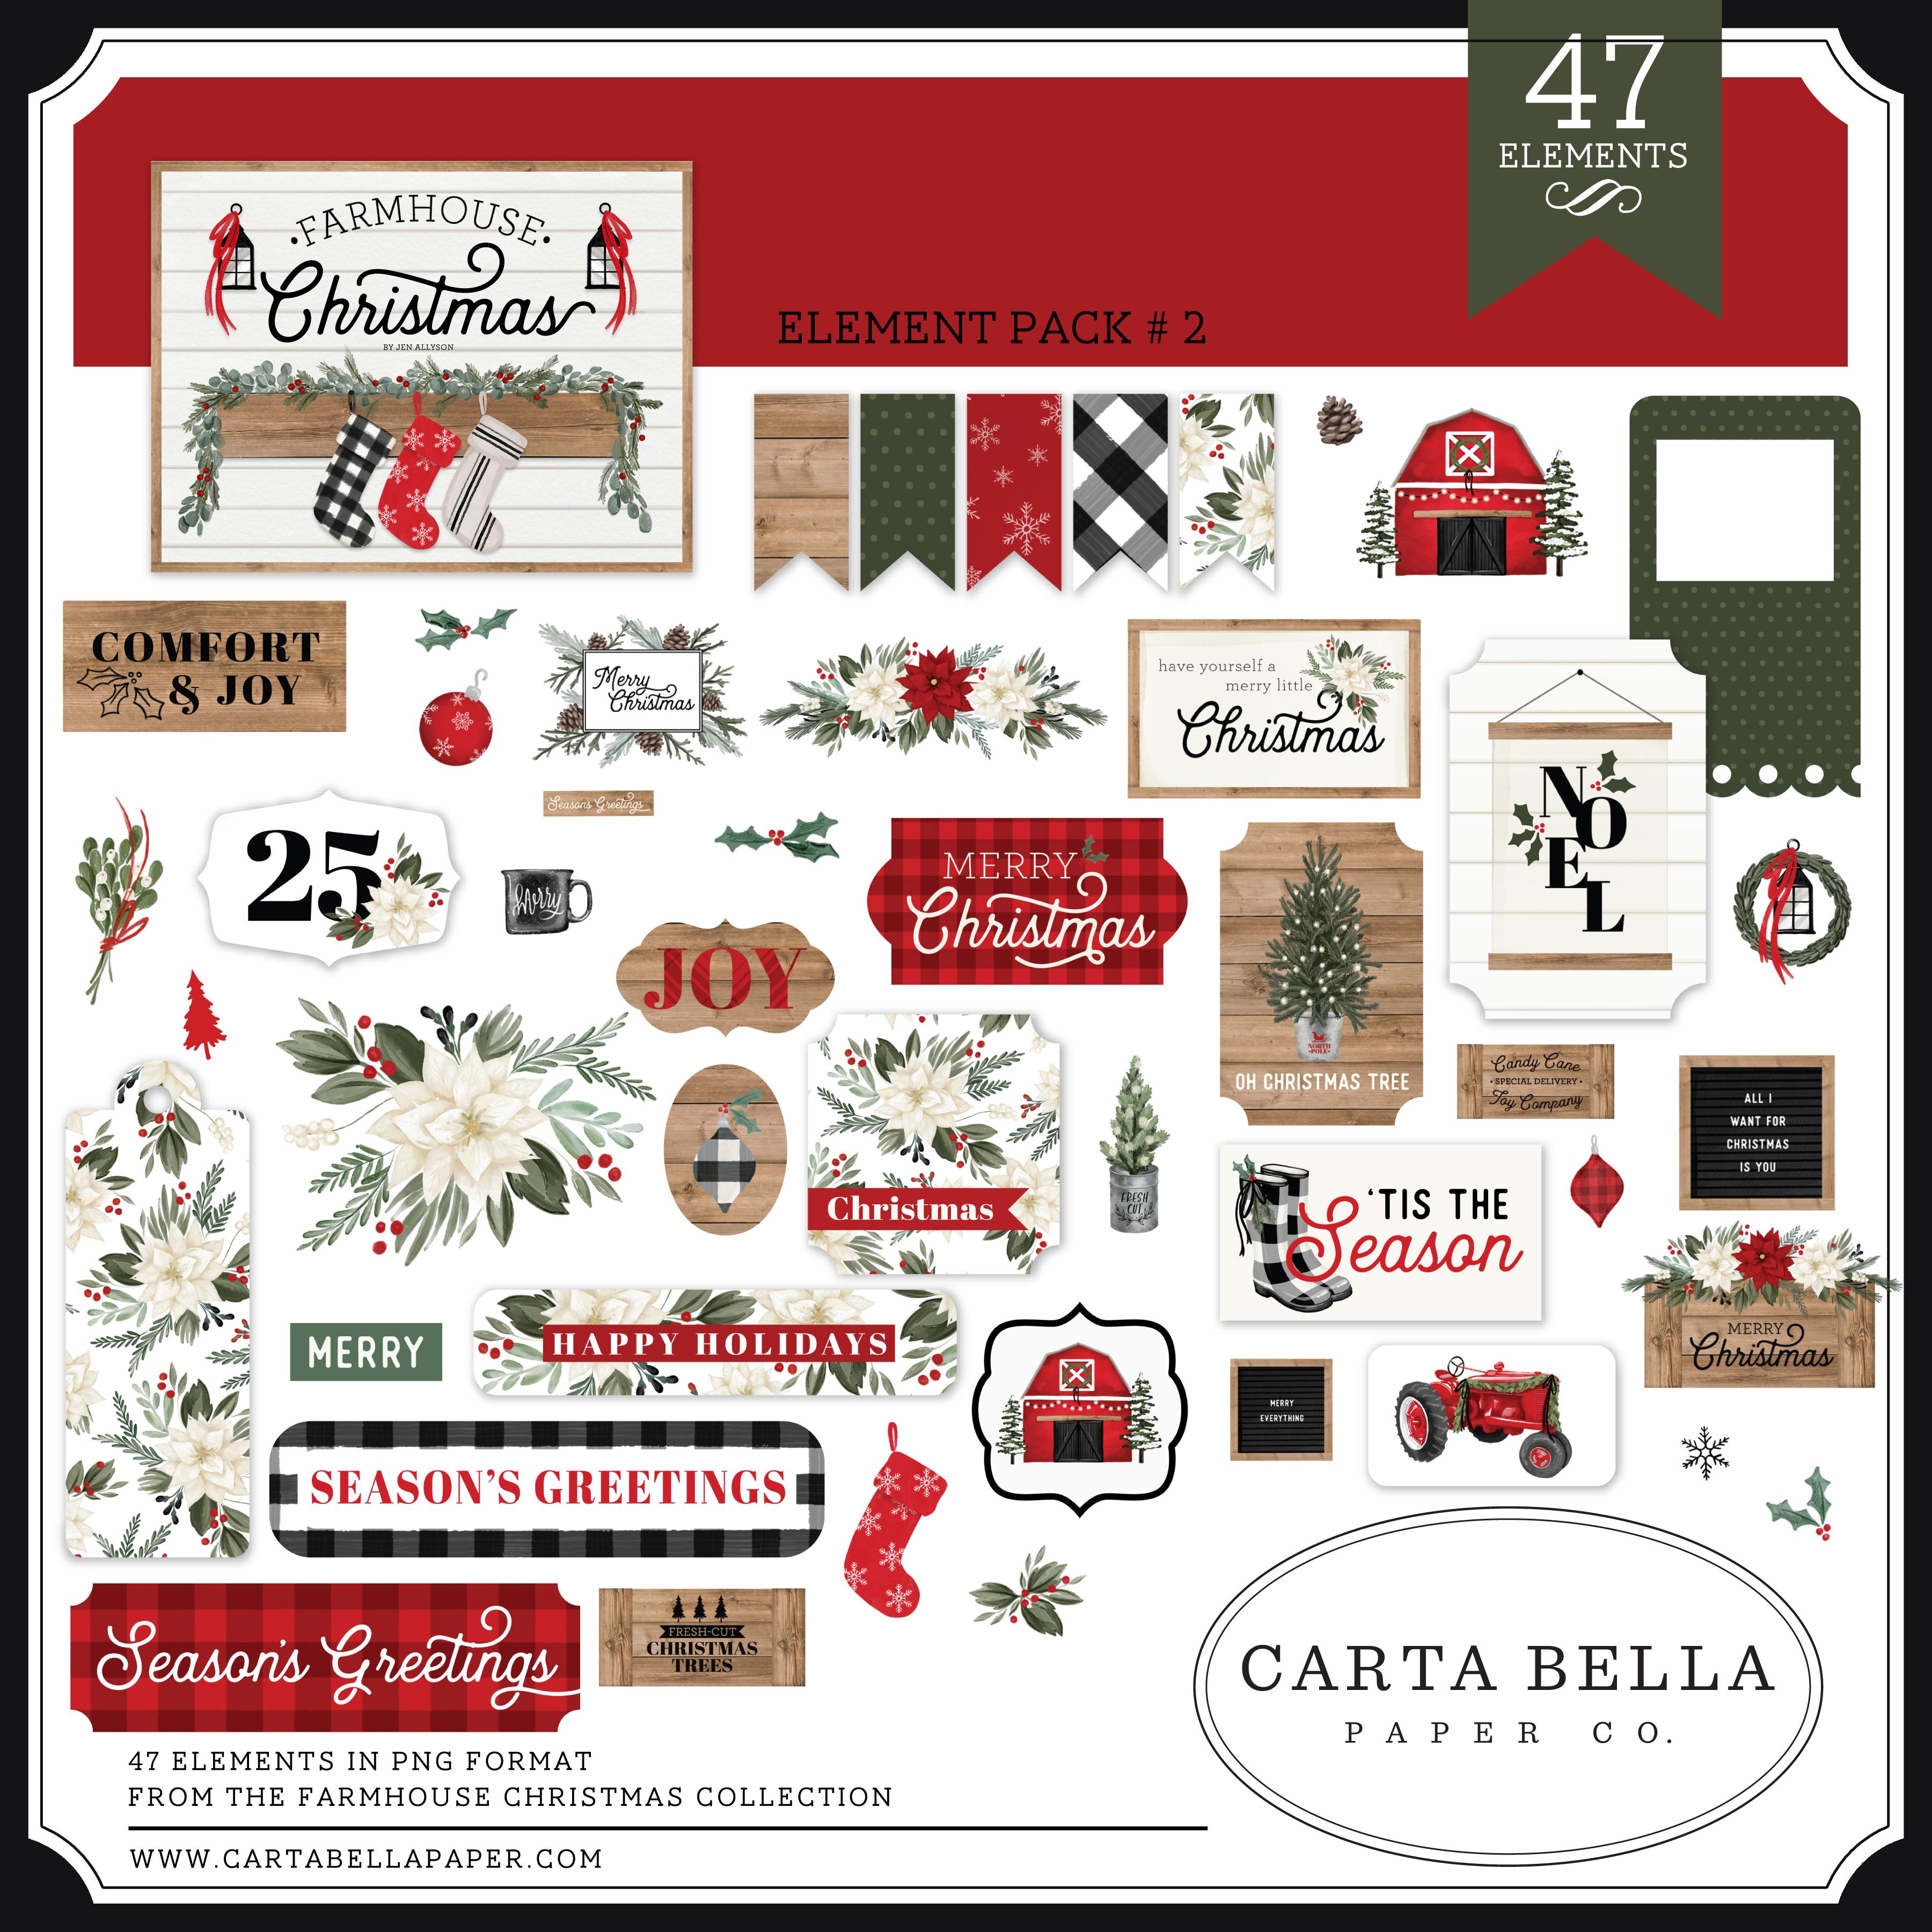 Farmhouse Christmas Element Pack #2